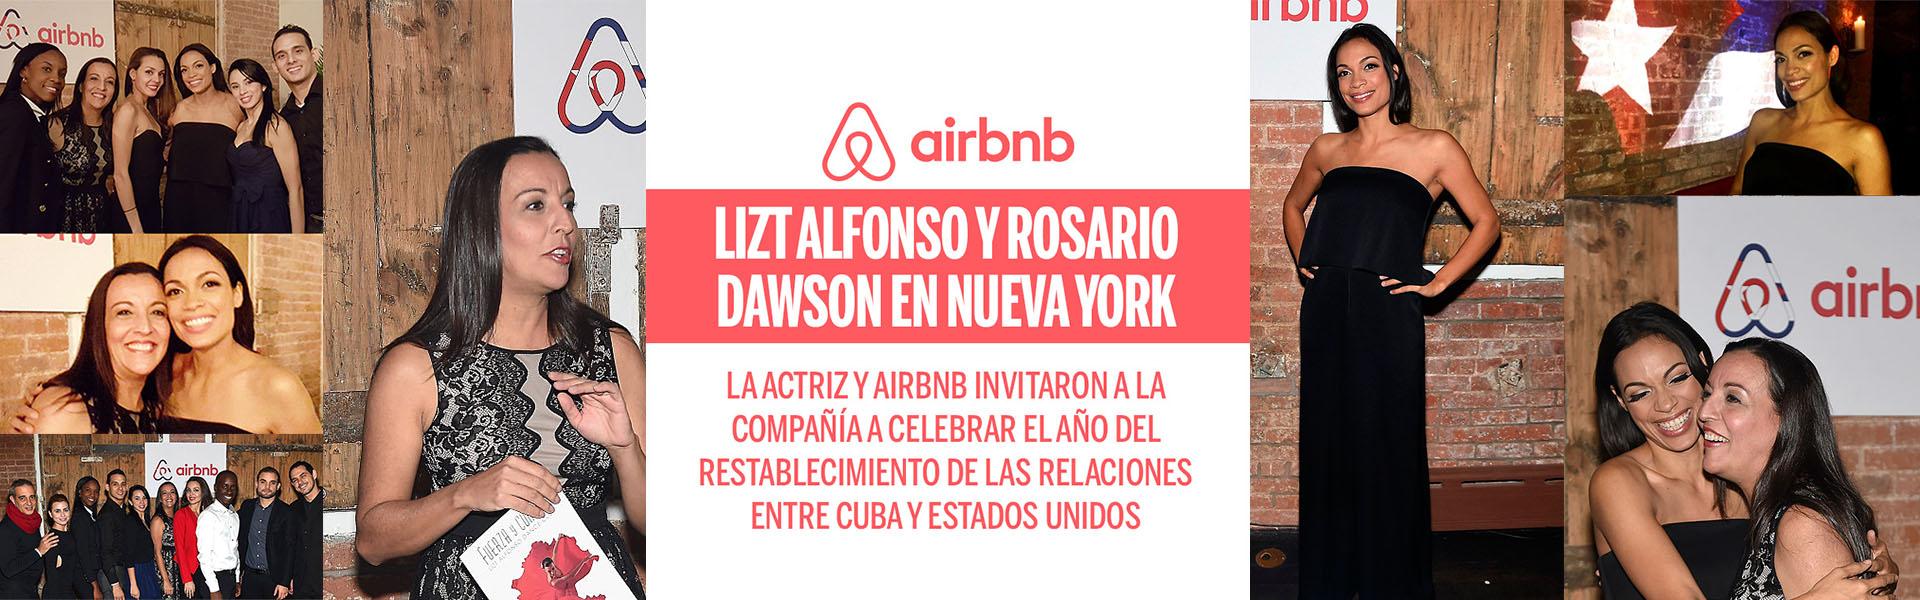 lizt-alfonso-y-rosario-dawson